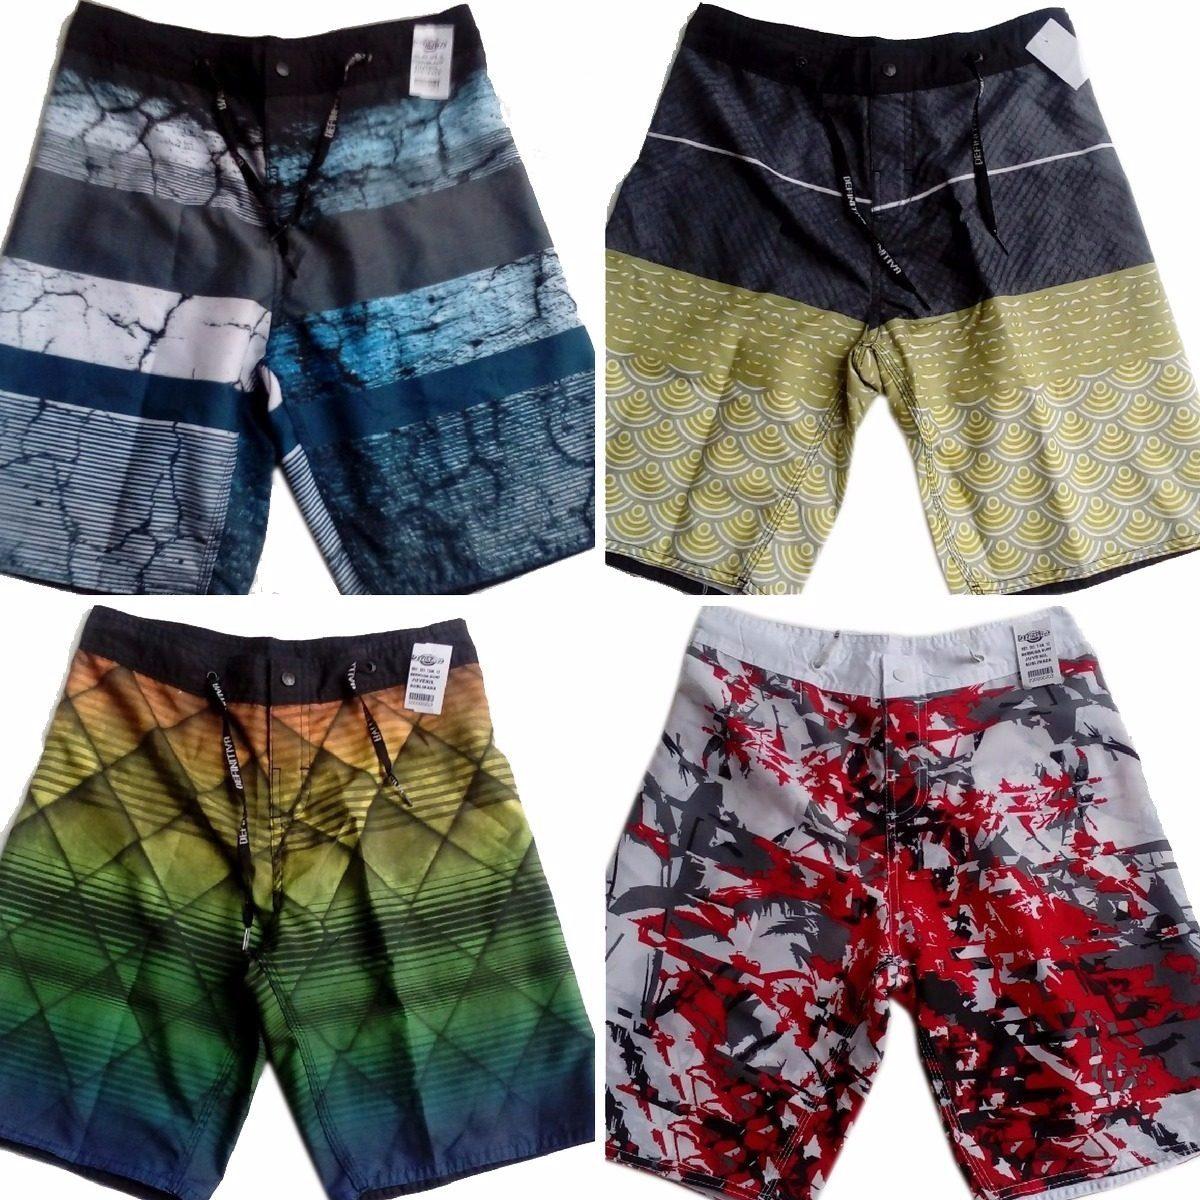 Promoção Rapida Kit C 5 Shorts Bermudas Tactel Infantil - R  99 43ee1eec453